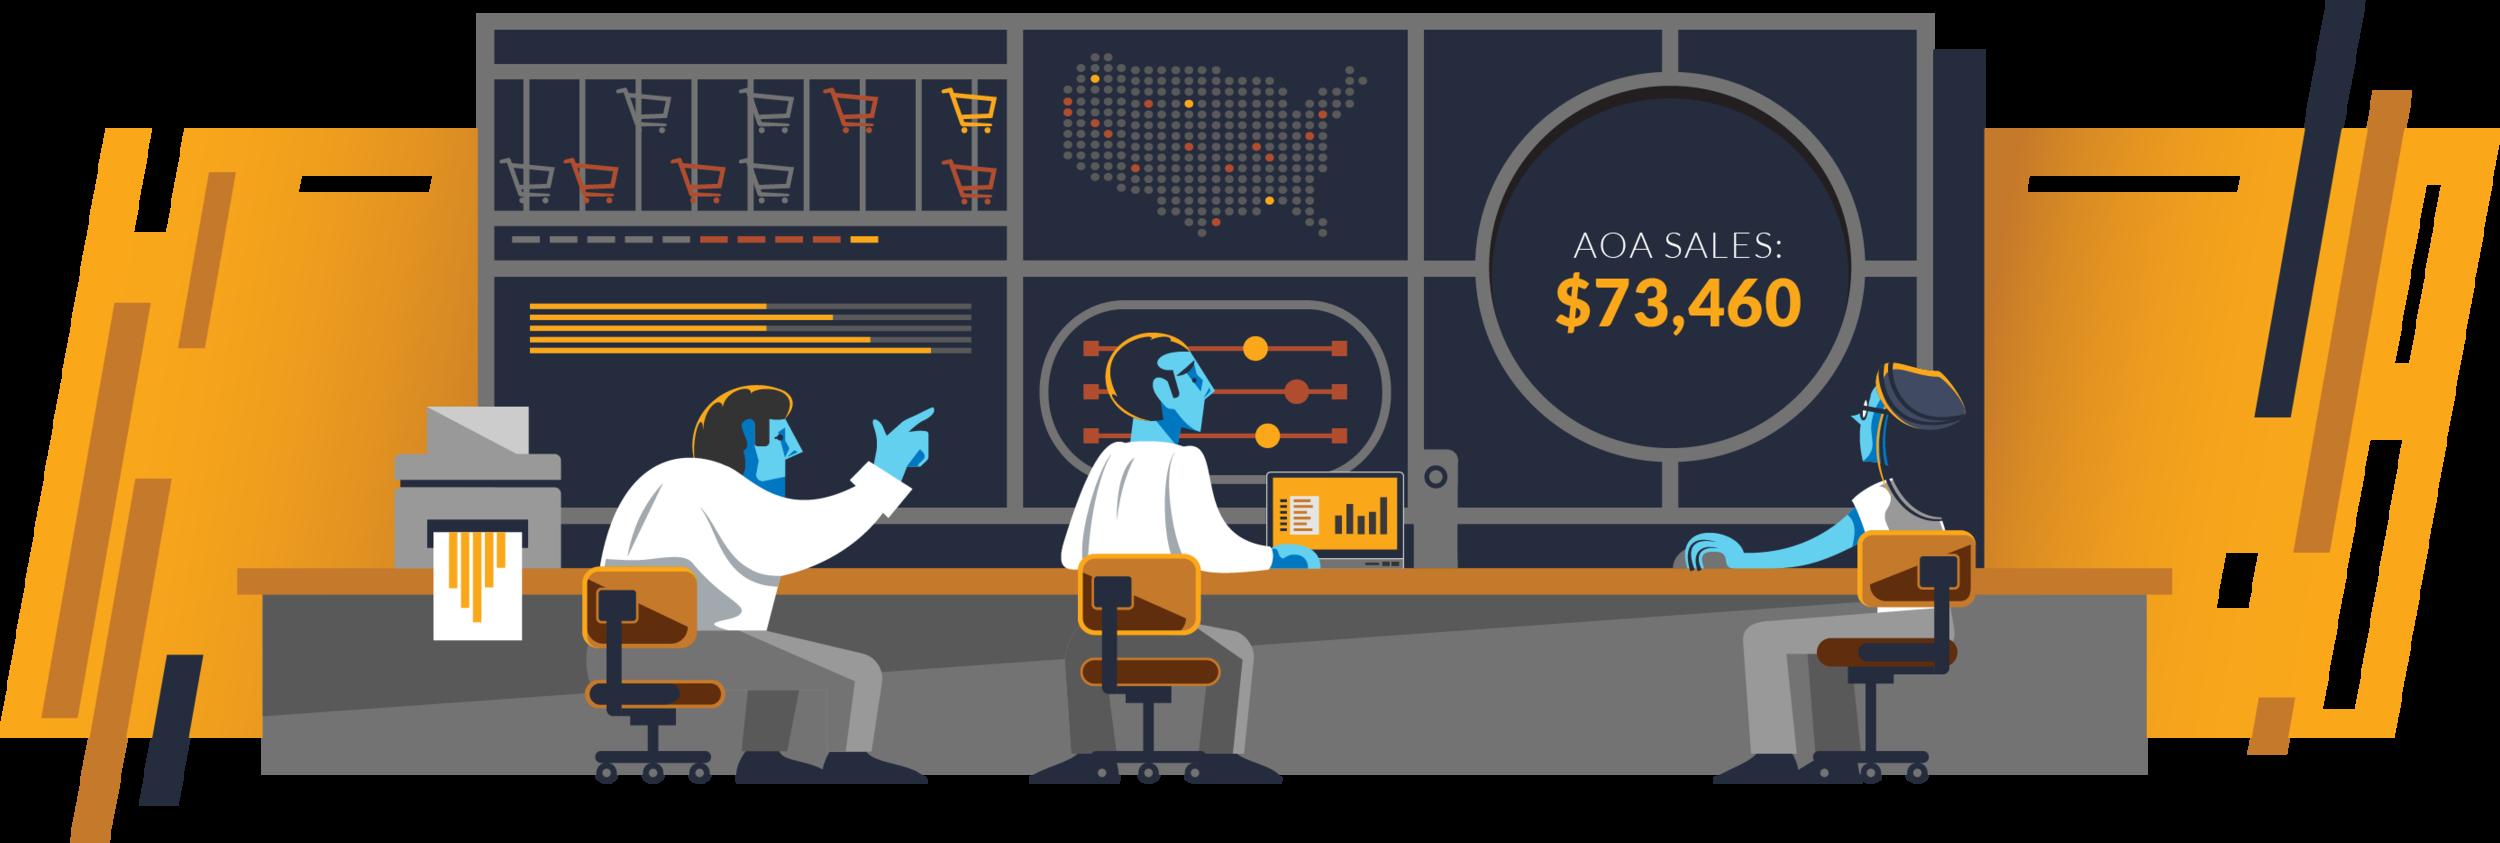 Purchase Data Metrics, hero spot illustration